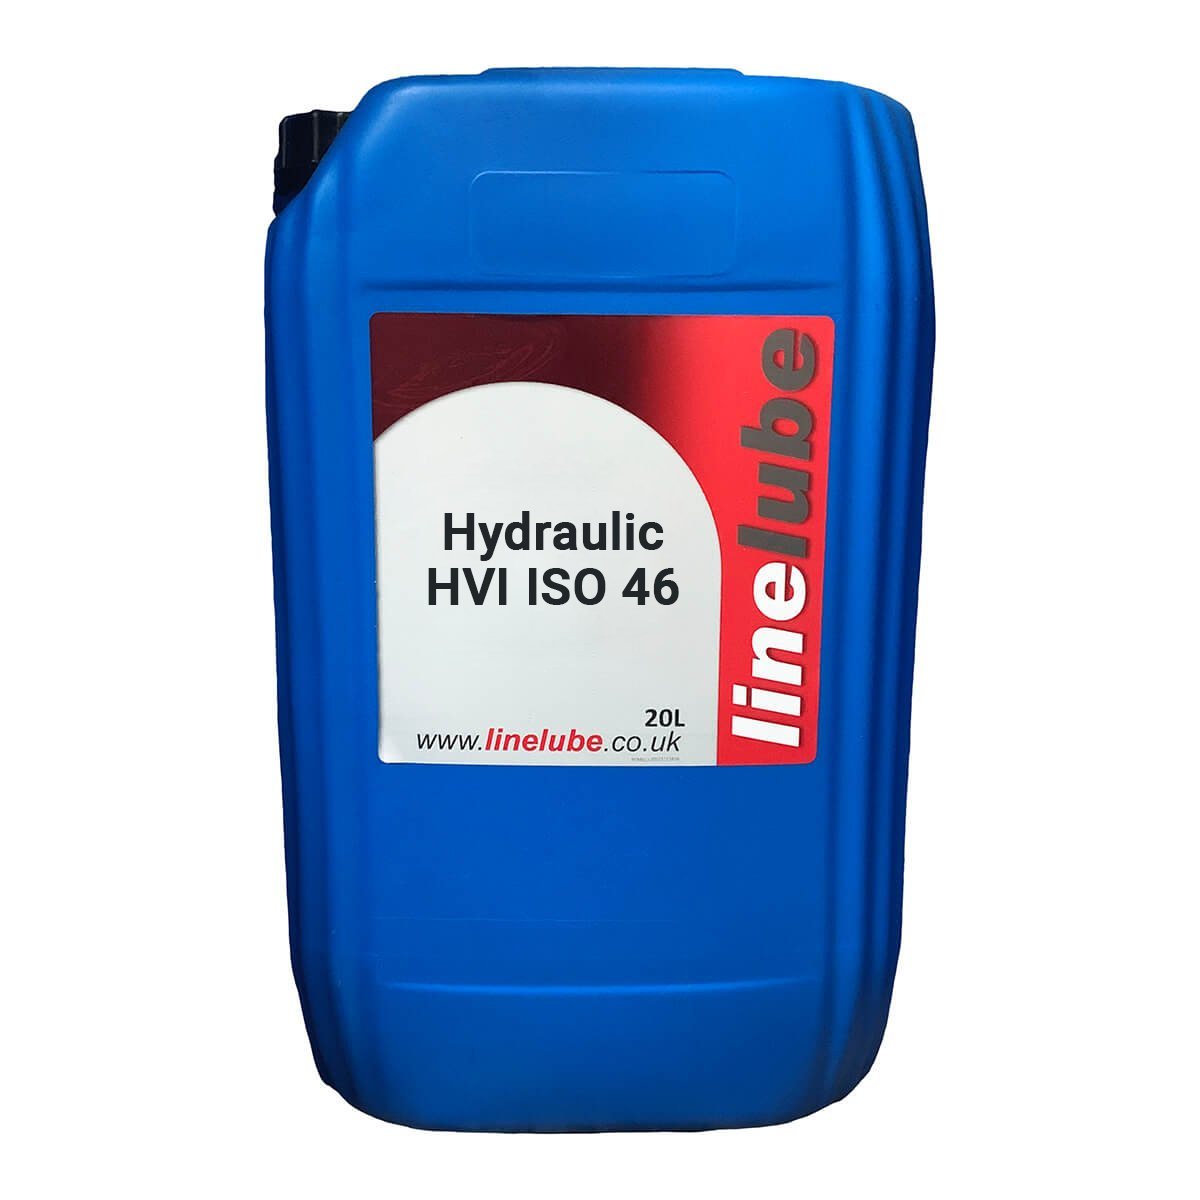 Linelube Hydraulic HVI ISO 46